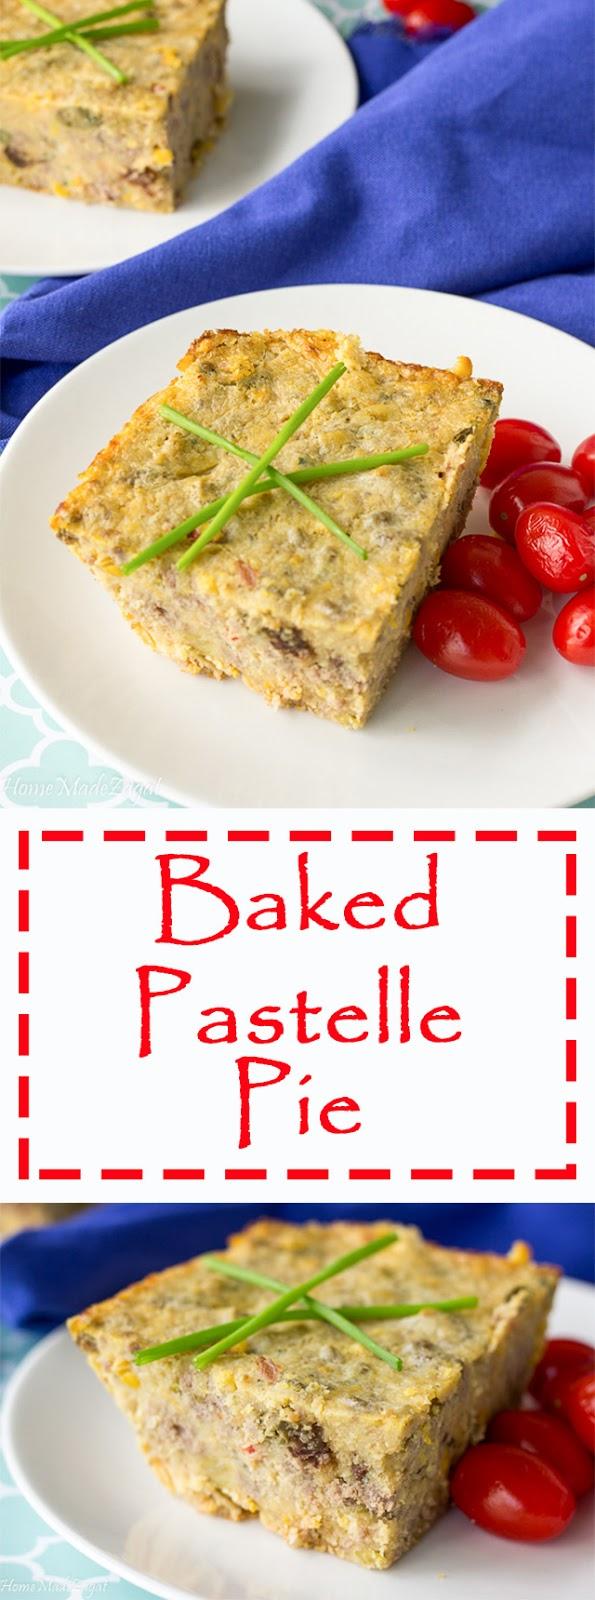 Pastelle Pie